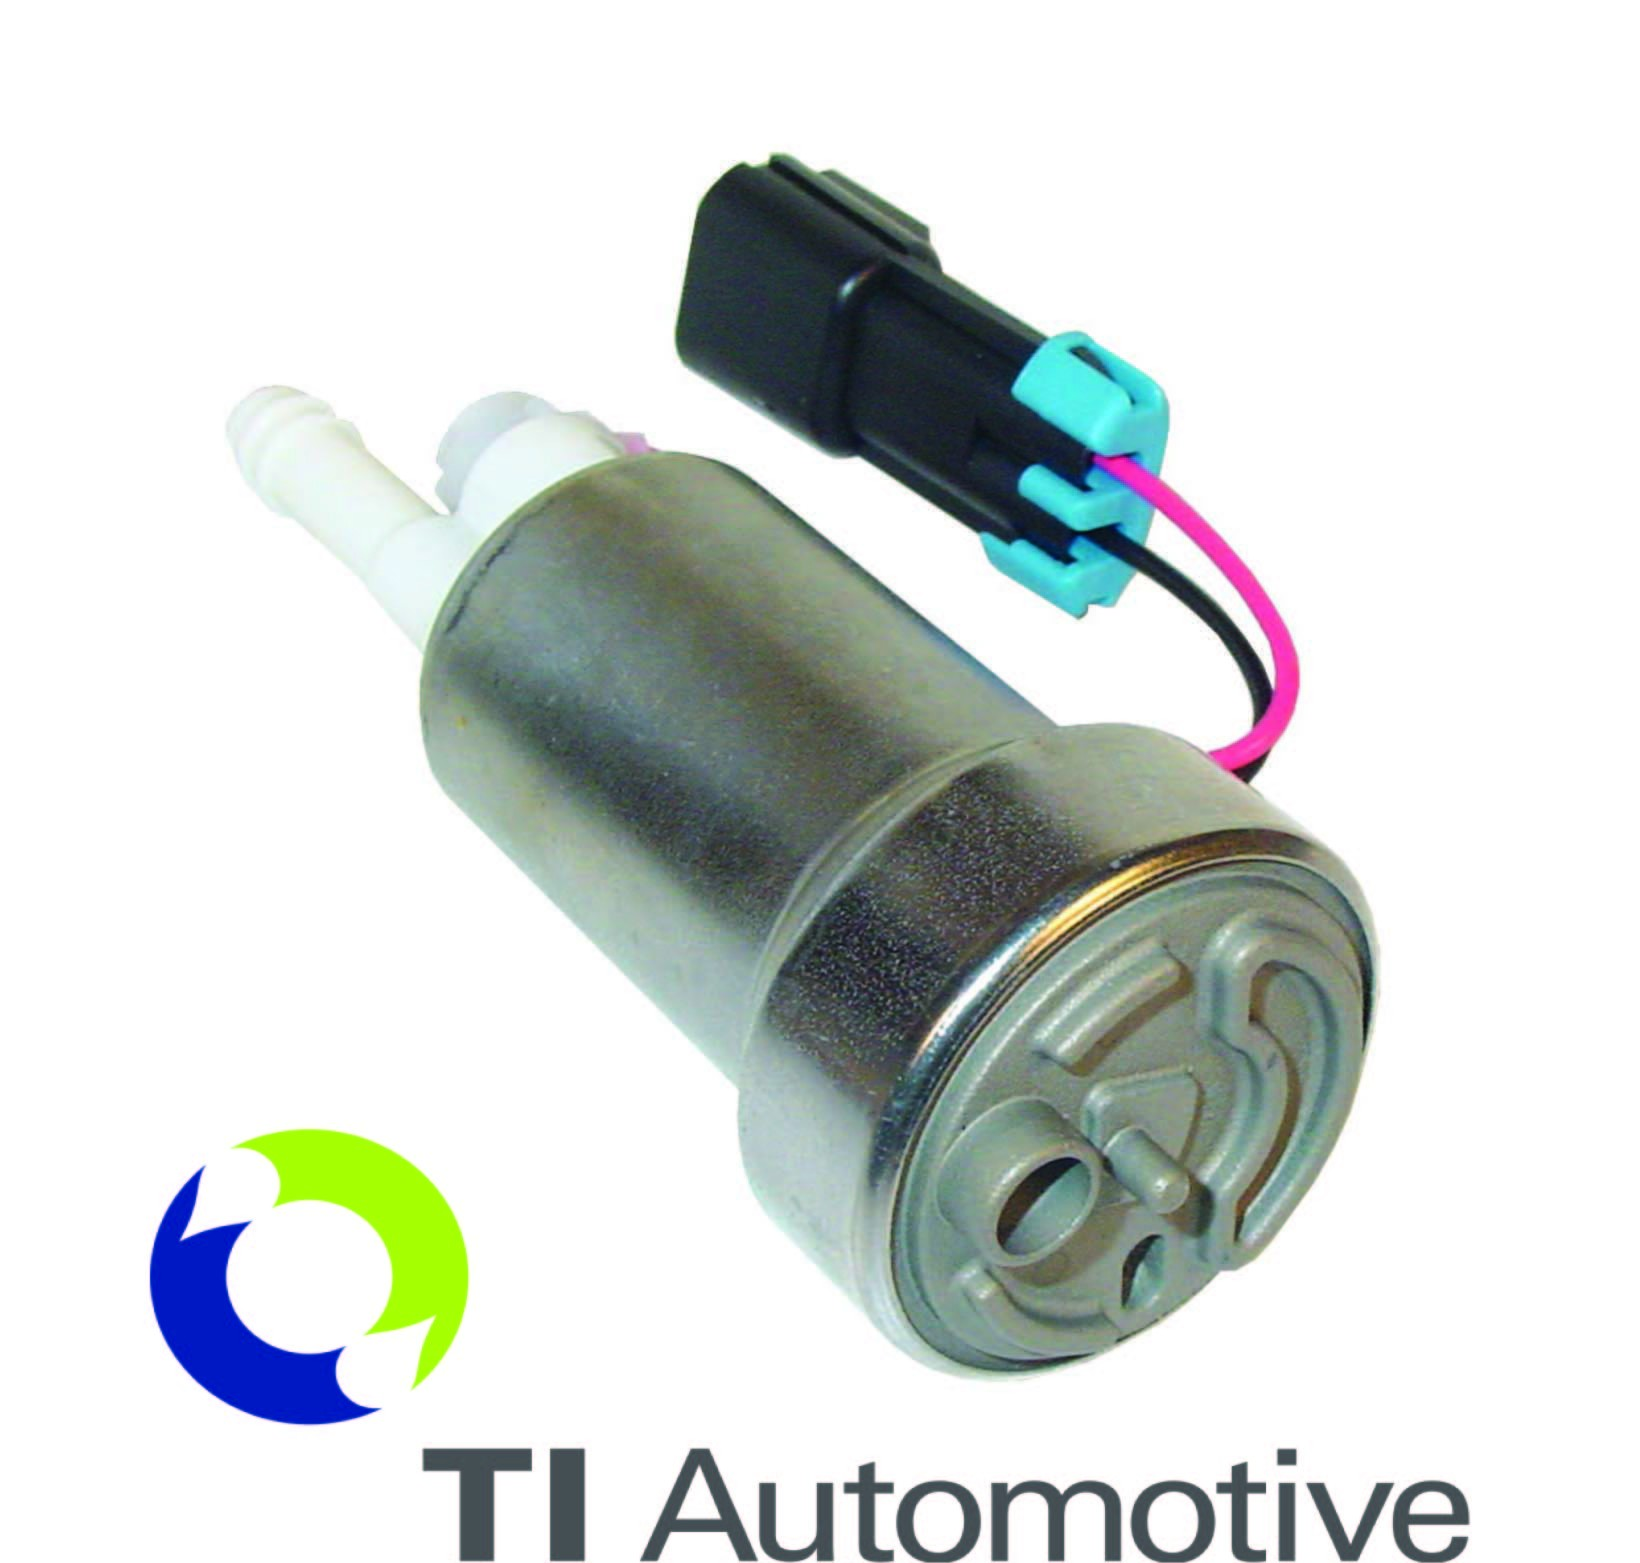 Ti Automotive (Walbro) 520 & 530 lph Fuel Pumps